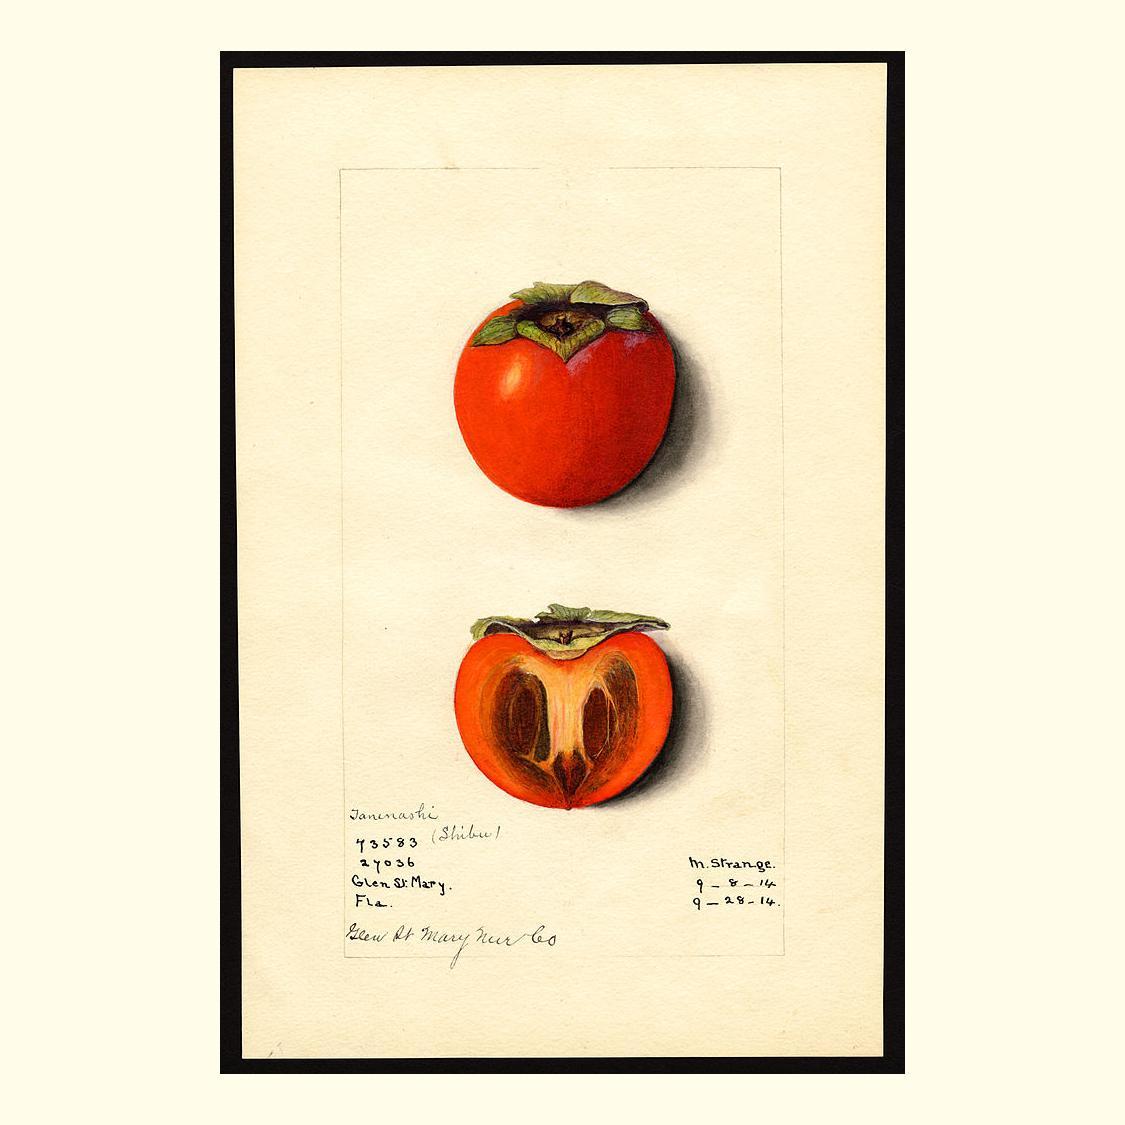 RT @pomological: tane nashi (shibu) persimmons, painted by m. strange, 1914 https://t.co/CdzaO0LuwF